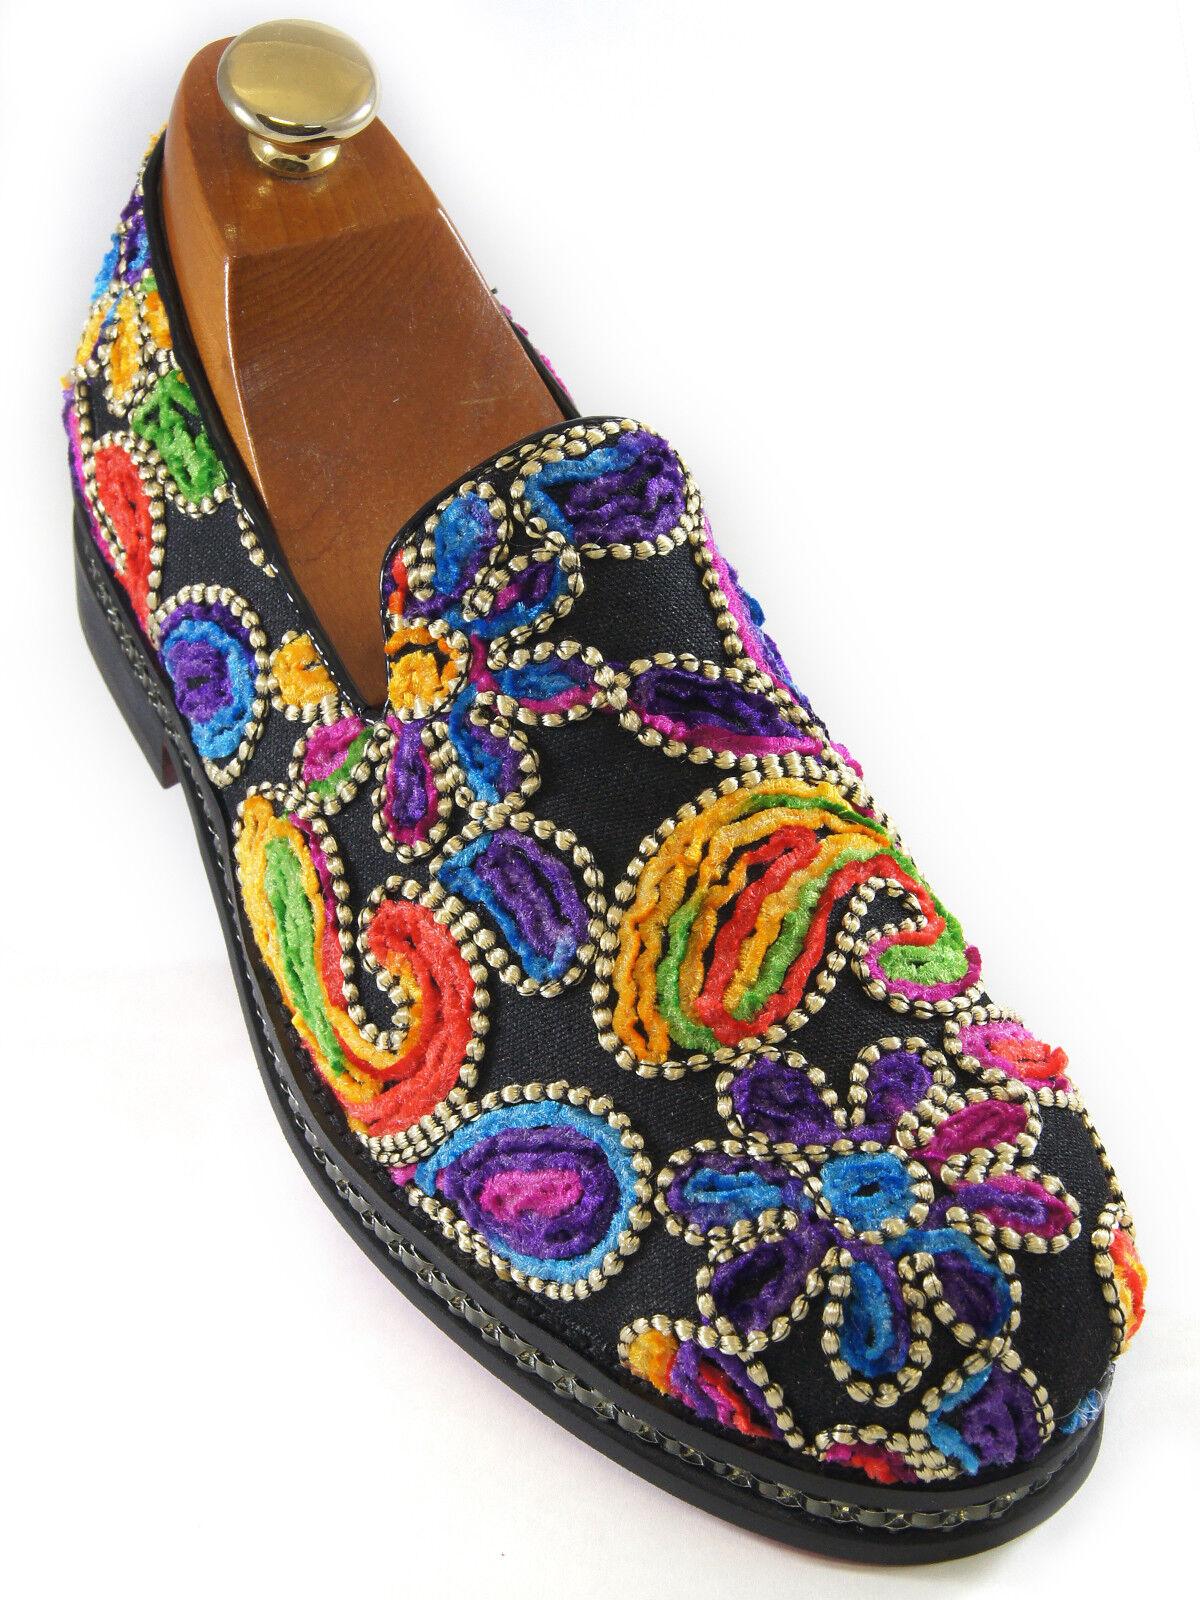 Fiesso Mens Multicolor Floral Stitchwork Paisley Pattern Embellished Loafer shoes